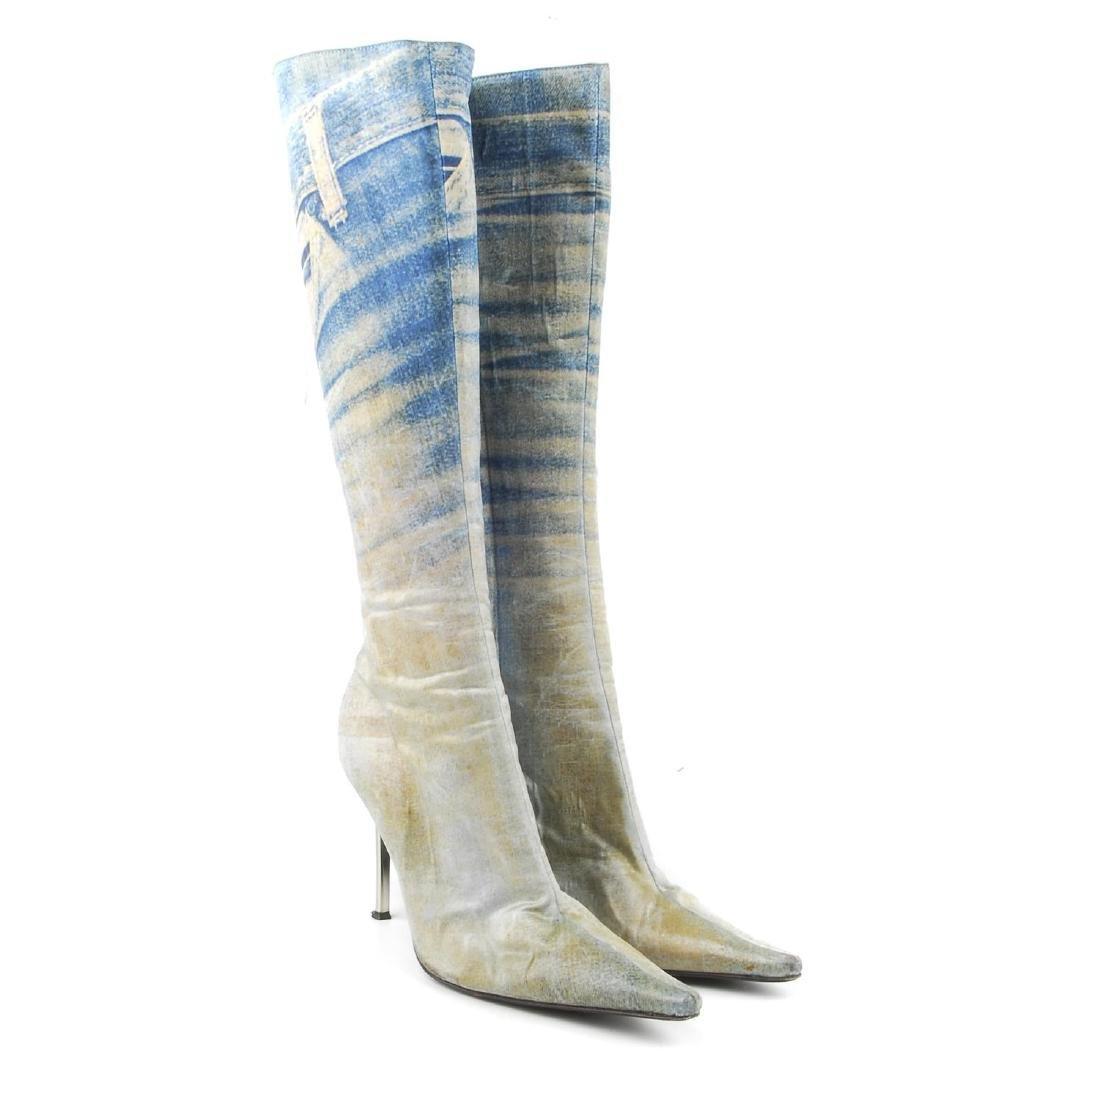 ROBERTO CAVALLI - a pair of 'denim look' boots.